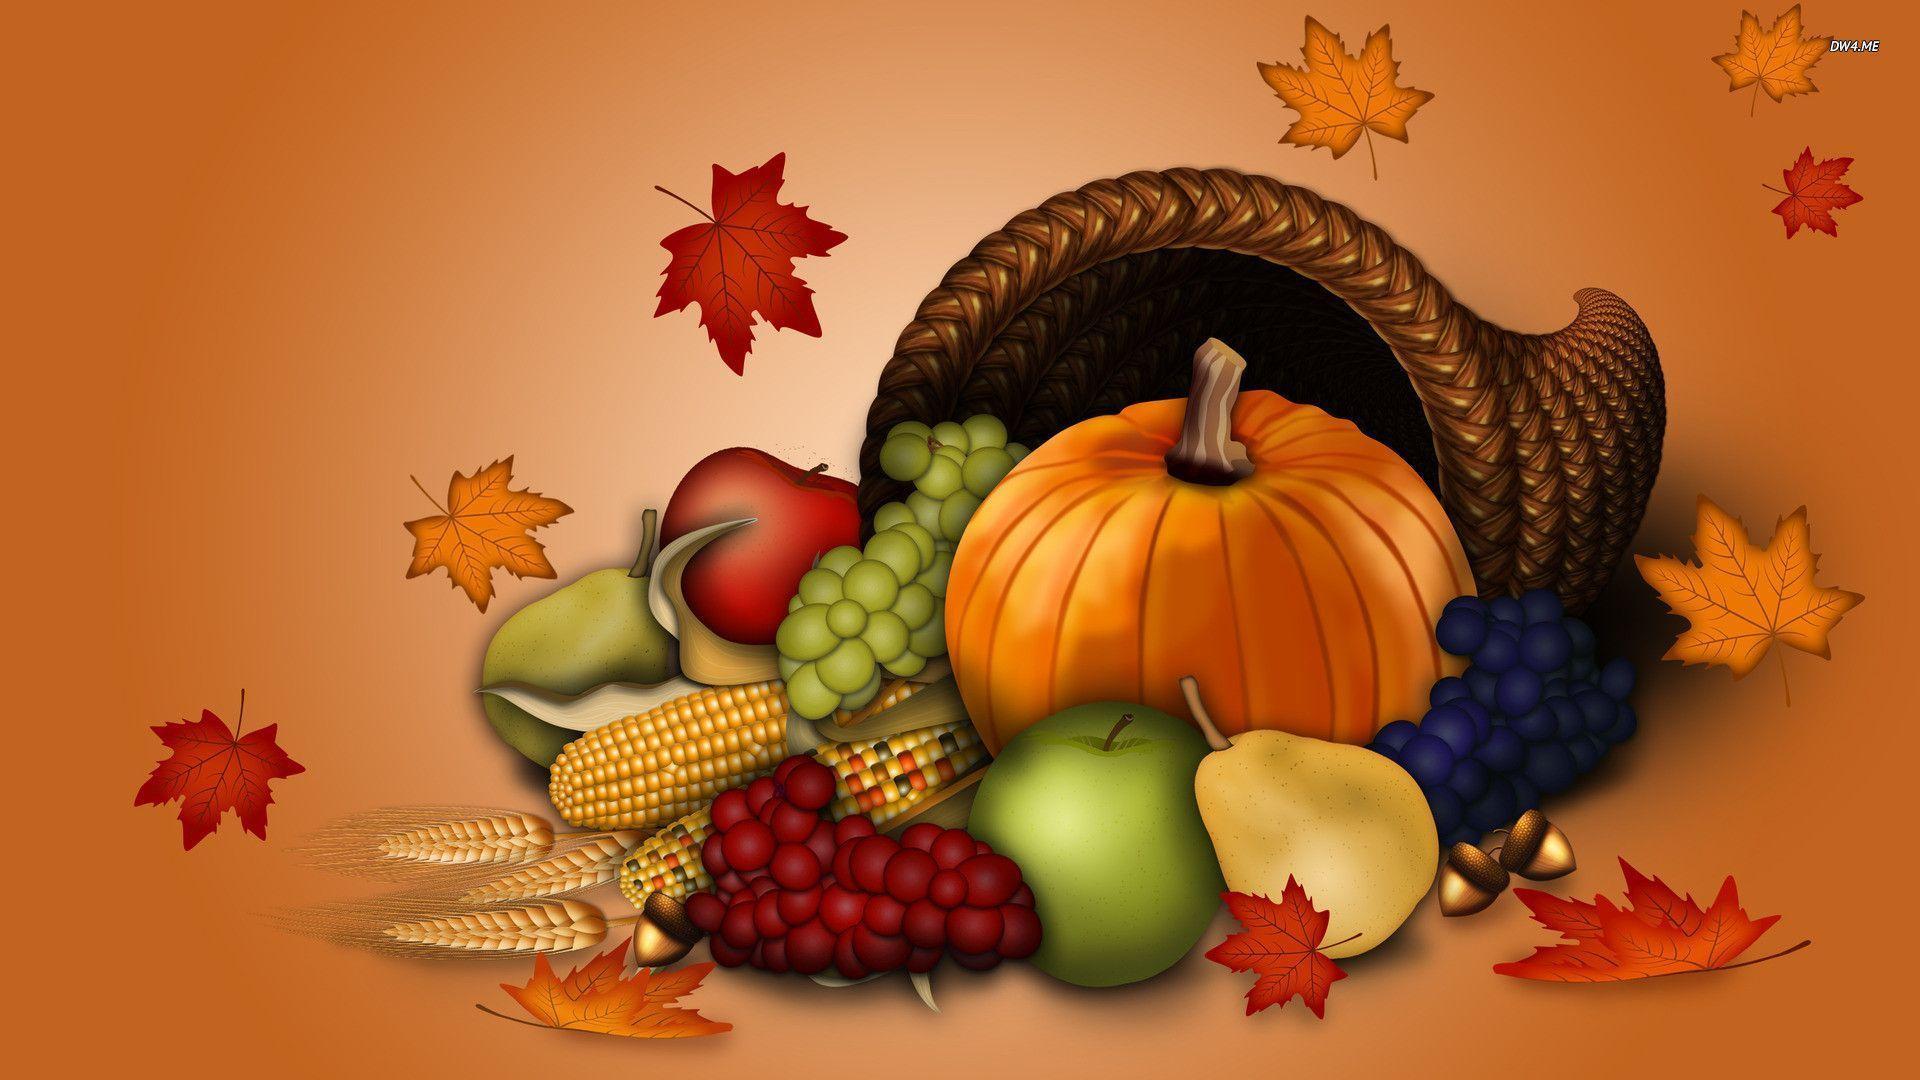 3D Thanksgiving Wallpapers 1920x1080